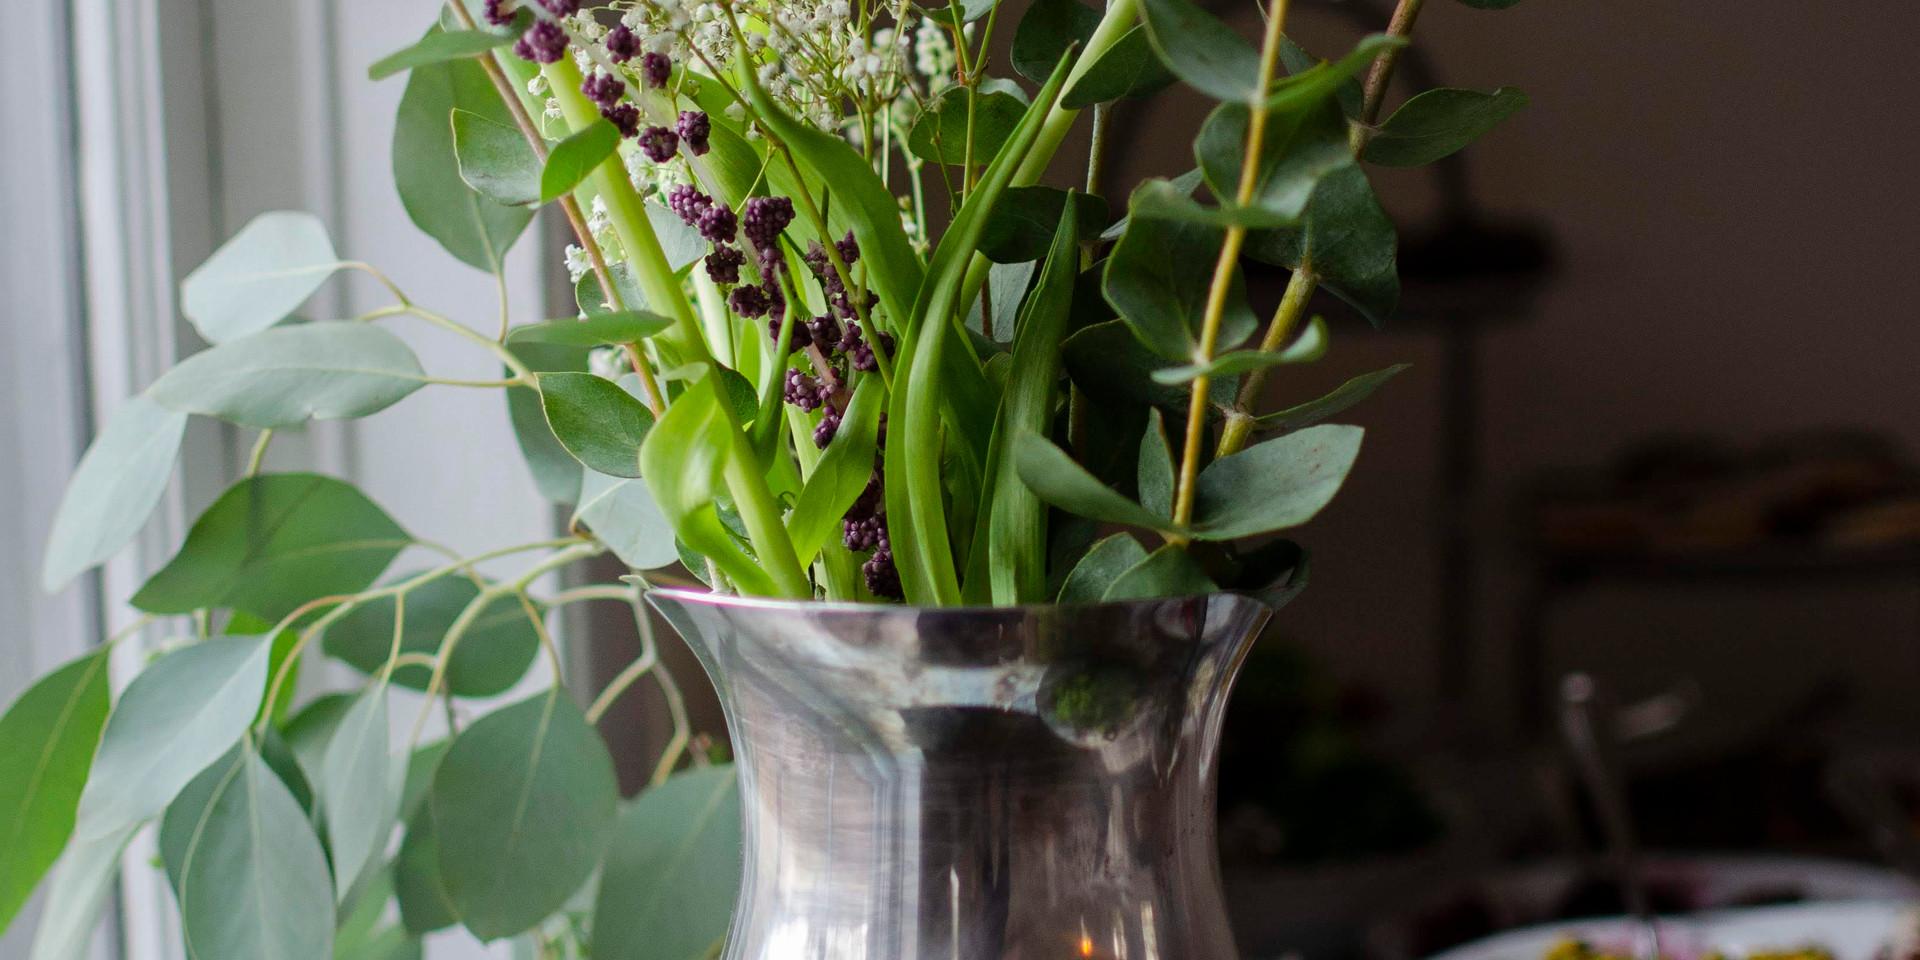 Silver Pitcher Vase